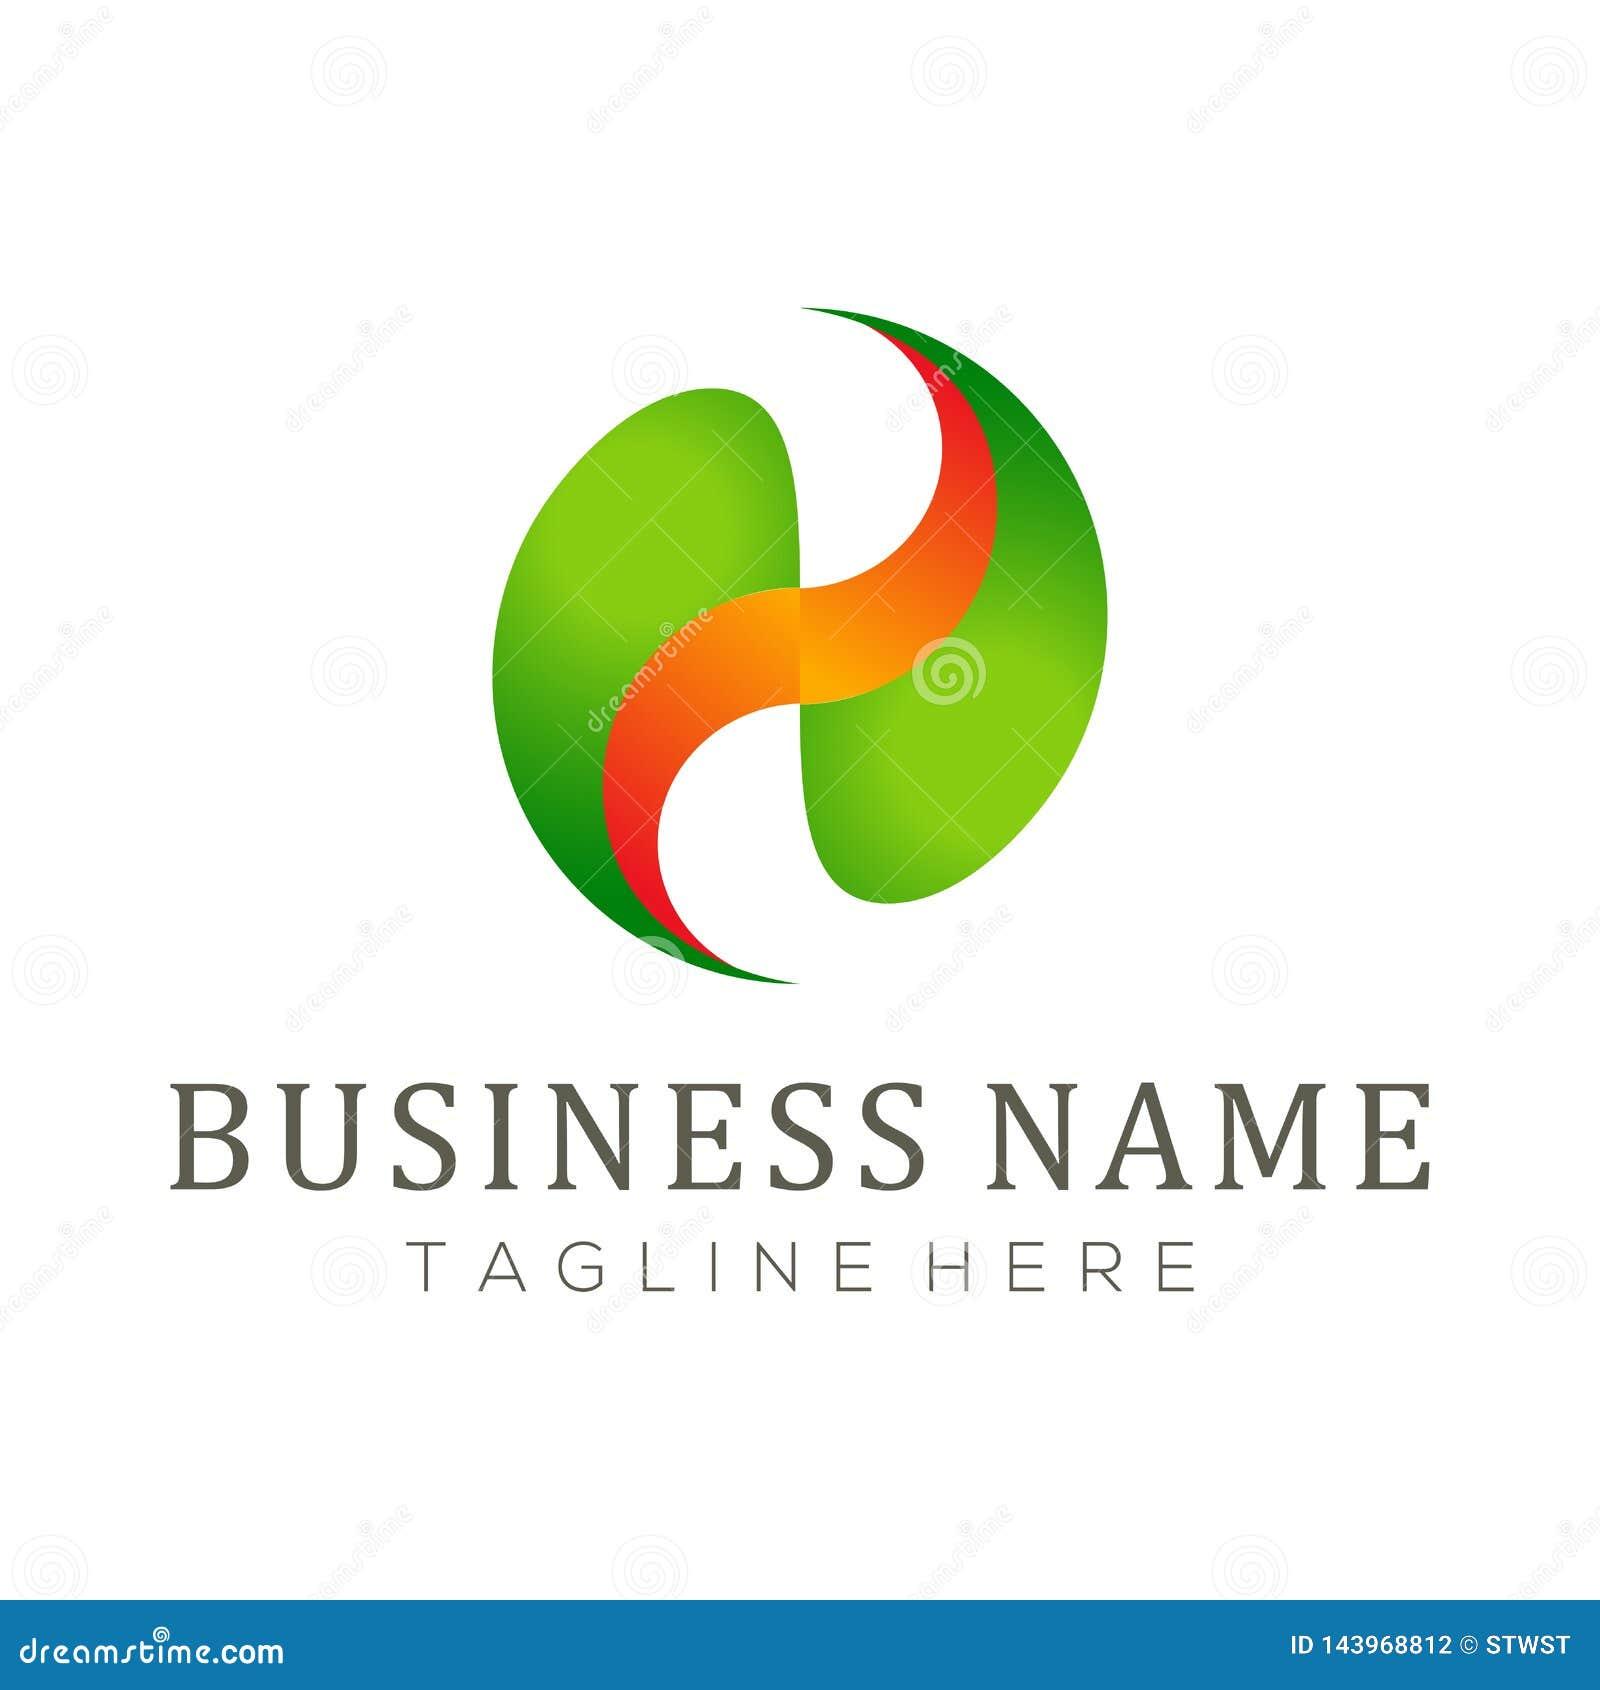 Insurance logo and icon design